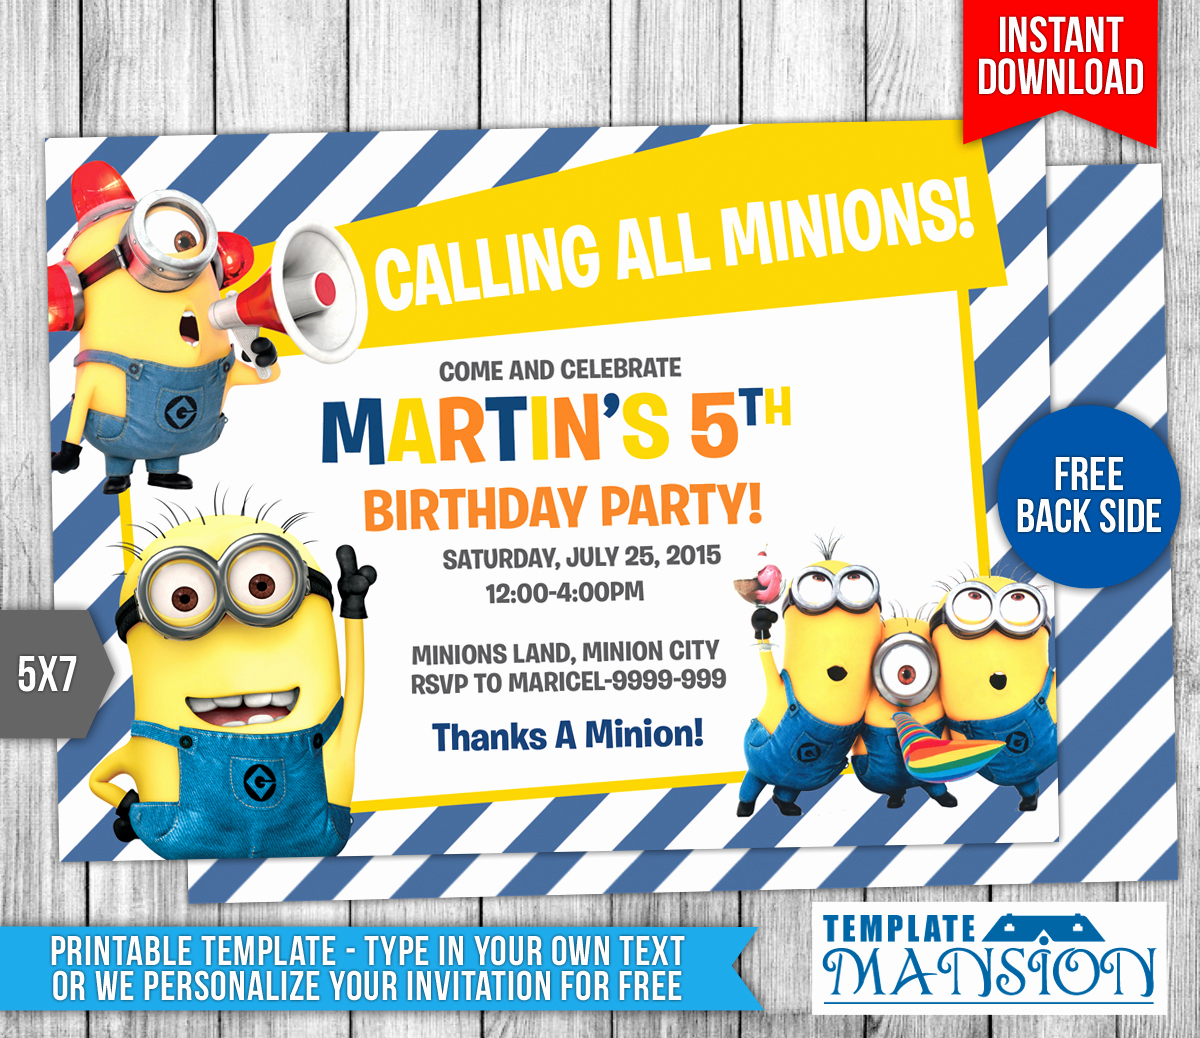 Minions Birthday Party Invitation Luxury Minions Birthday Invitation 7 by Templatemansion On